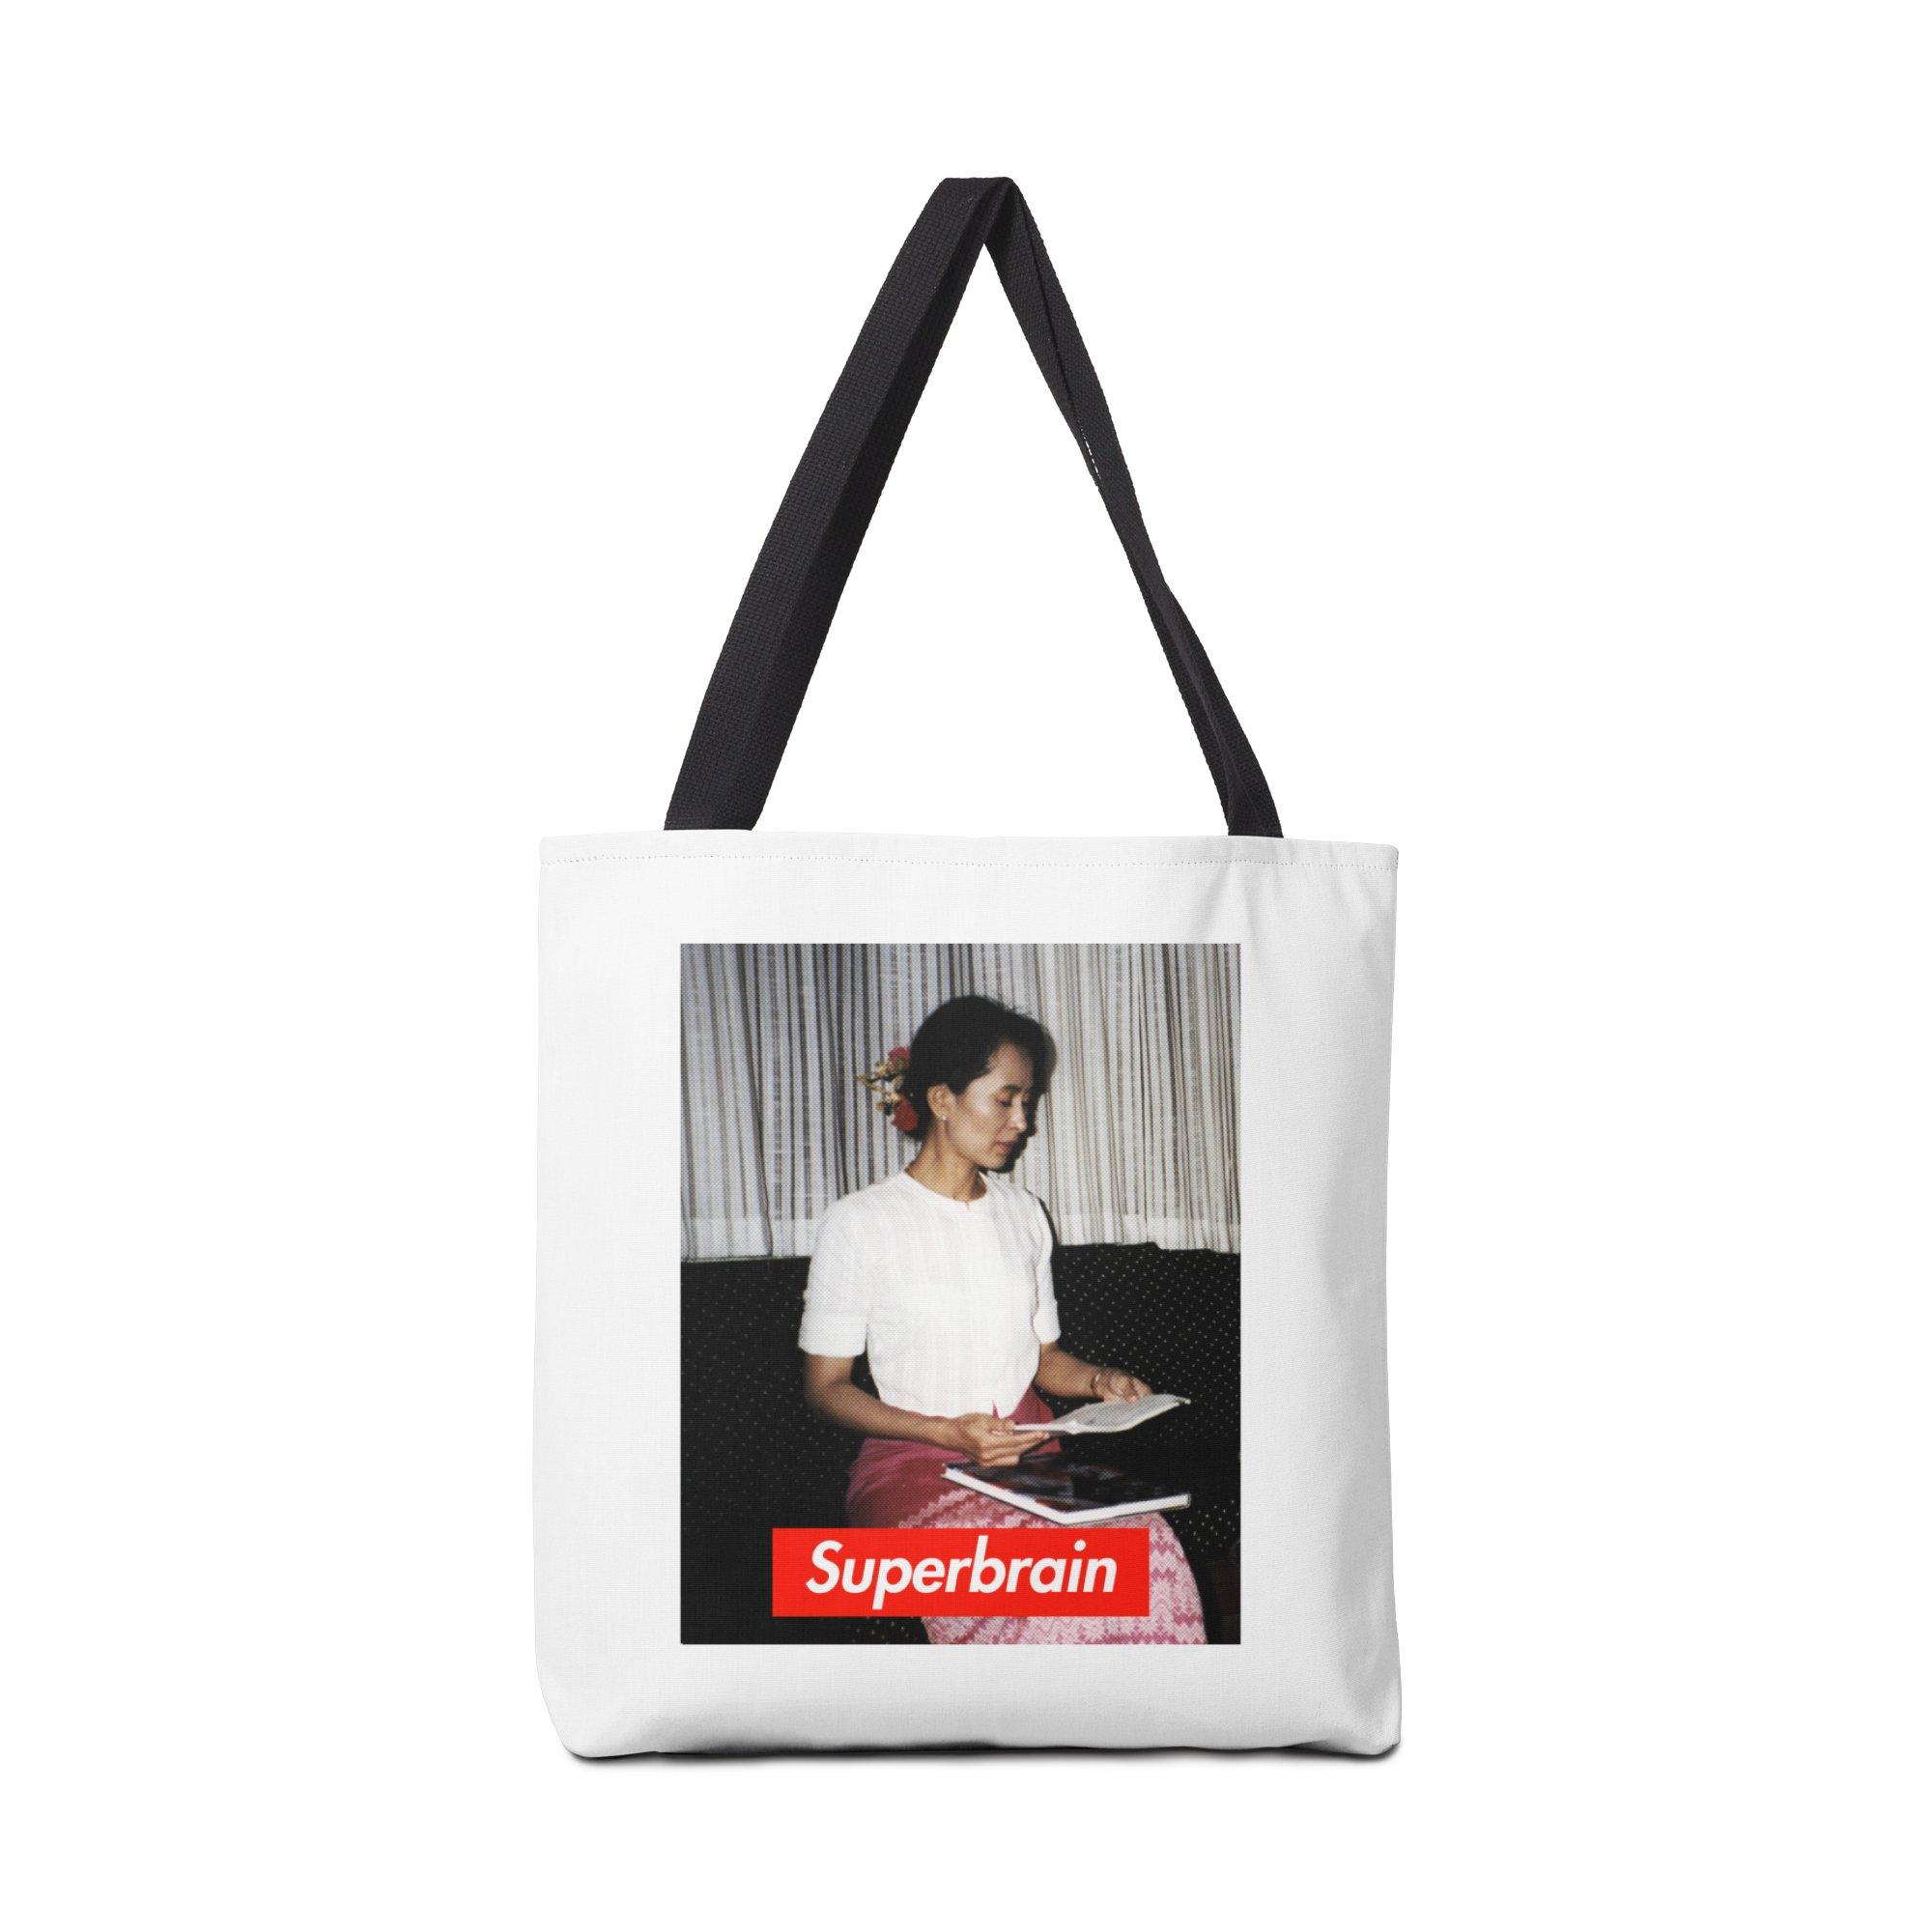 Superbrain - Aung San Suu Kyi Accessories by WeandJeeb's Artist Shop